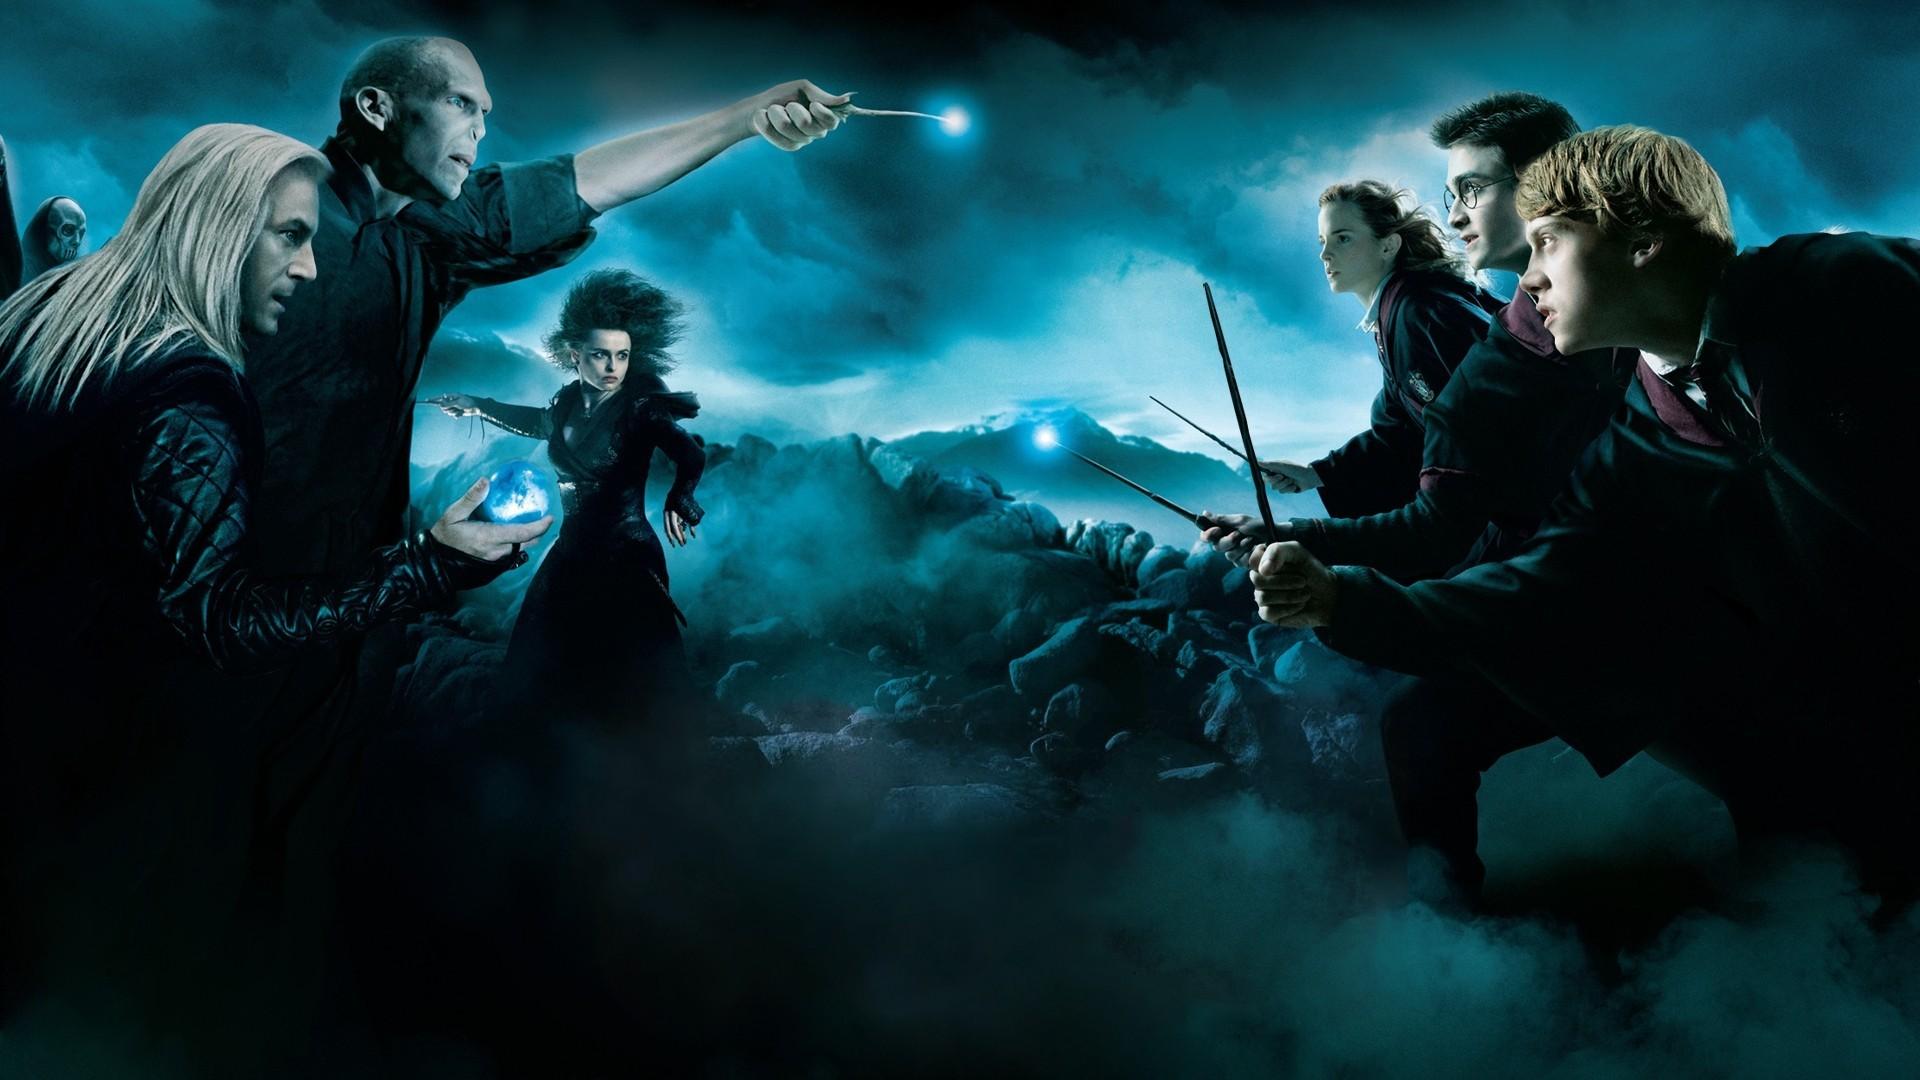 General 1920x1080 Harry Potter Lord Voldemort Hermiona Granger Ron Weasley